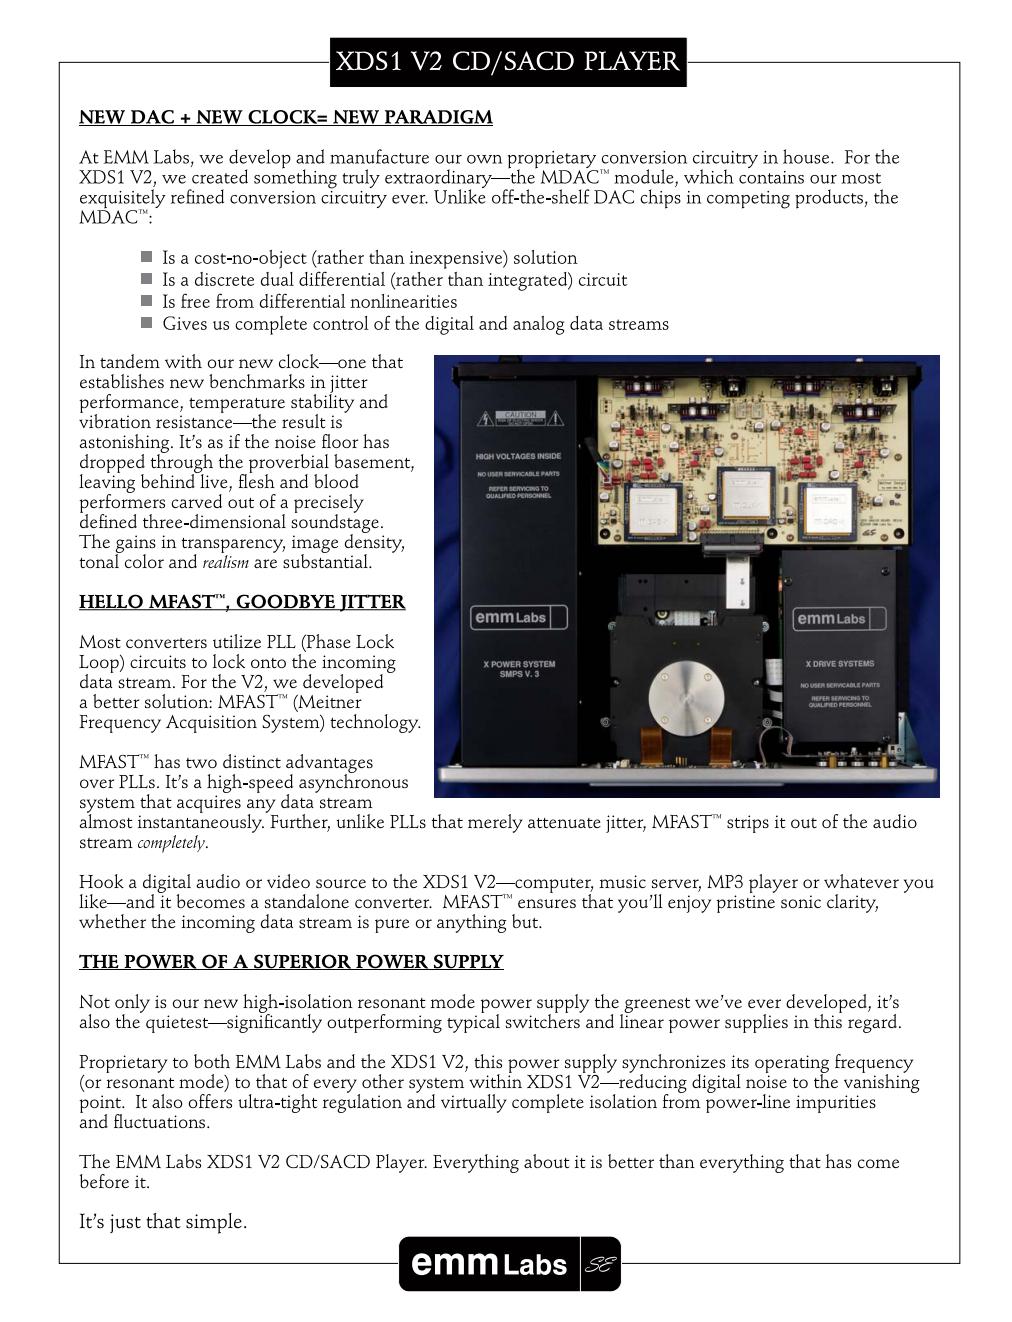 emmlabs-xds1-v2-cd-player-brochure-2